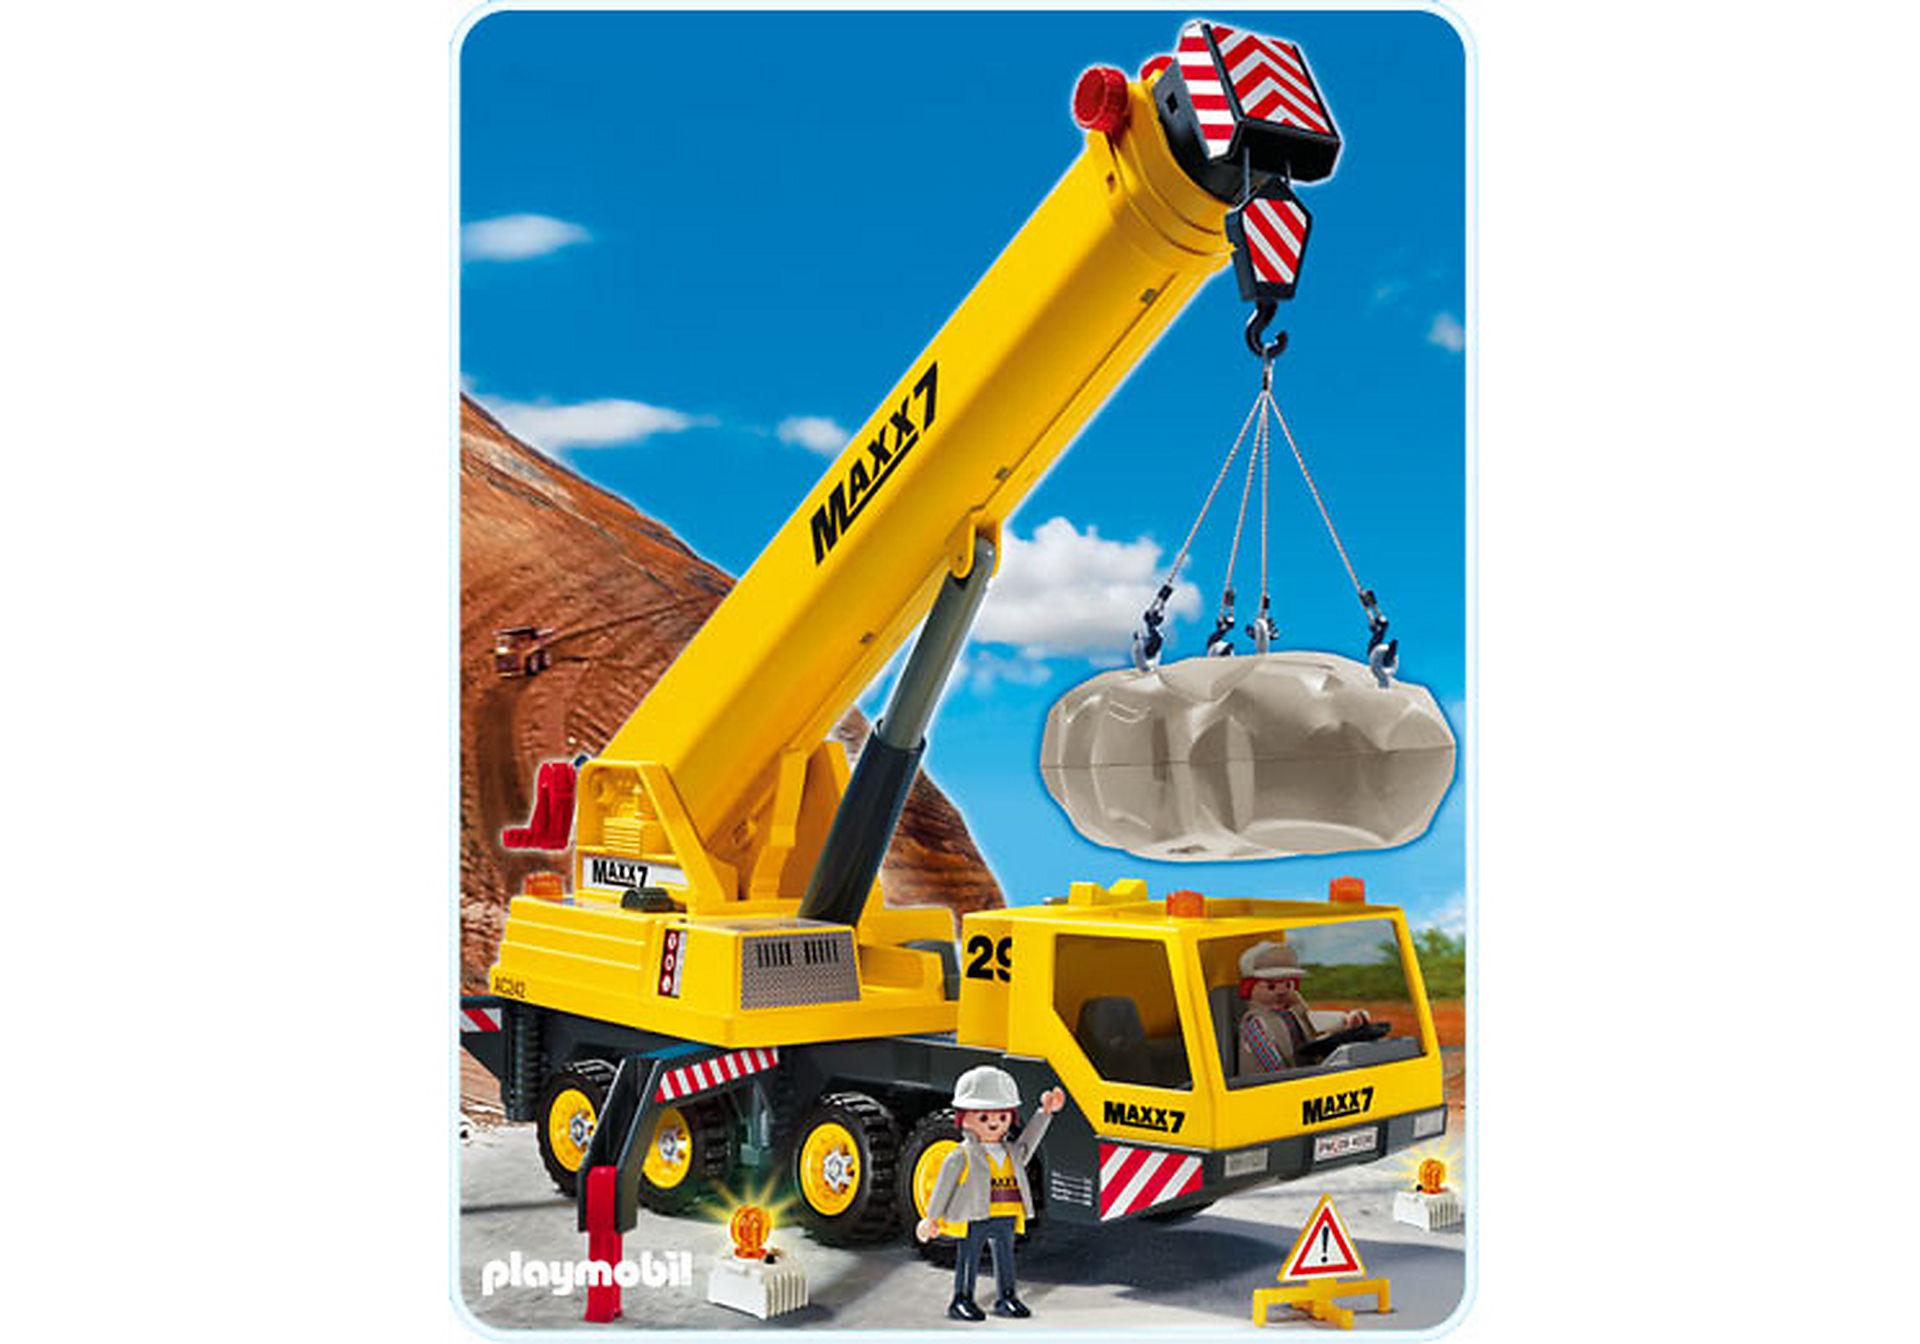 http://media.playmobil.com/i/playmobil/4036-A_product_detail/Schwerlast-Mobilkran